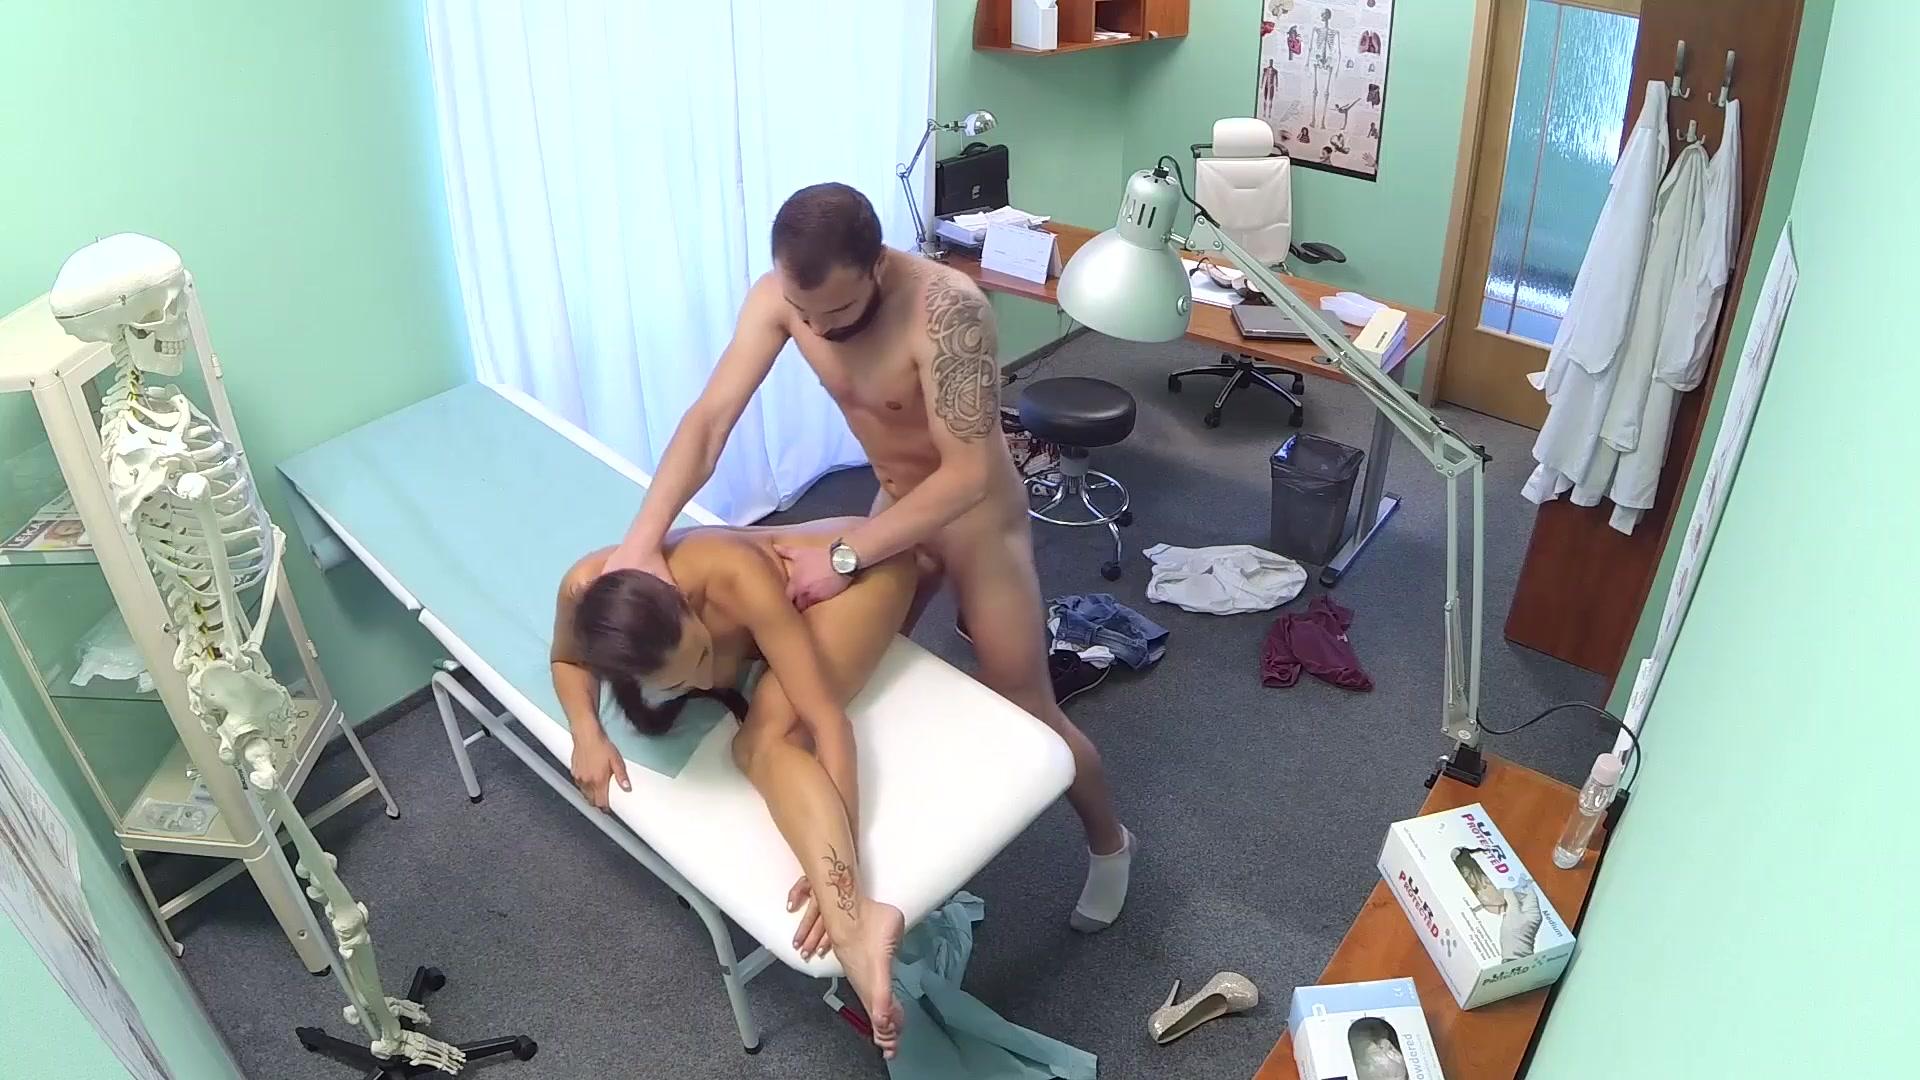 Nurse Fucking The Hospital